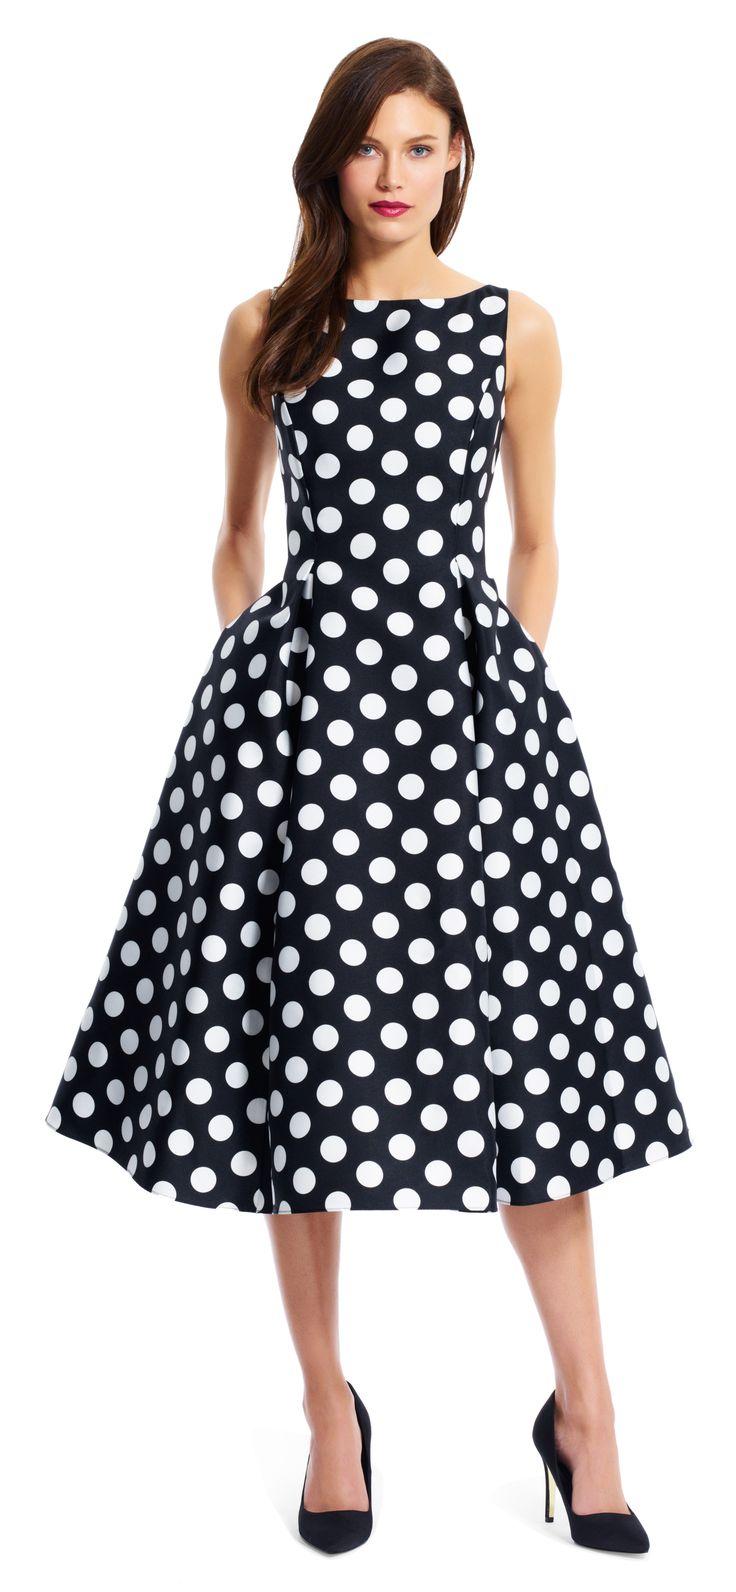 Classic And Feminine This Stunning Polka Dot Printed